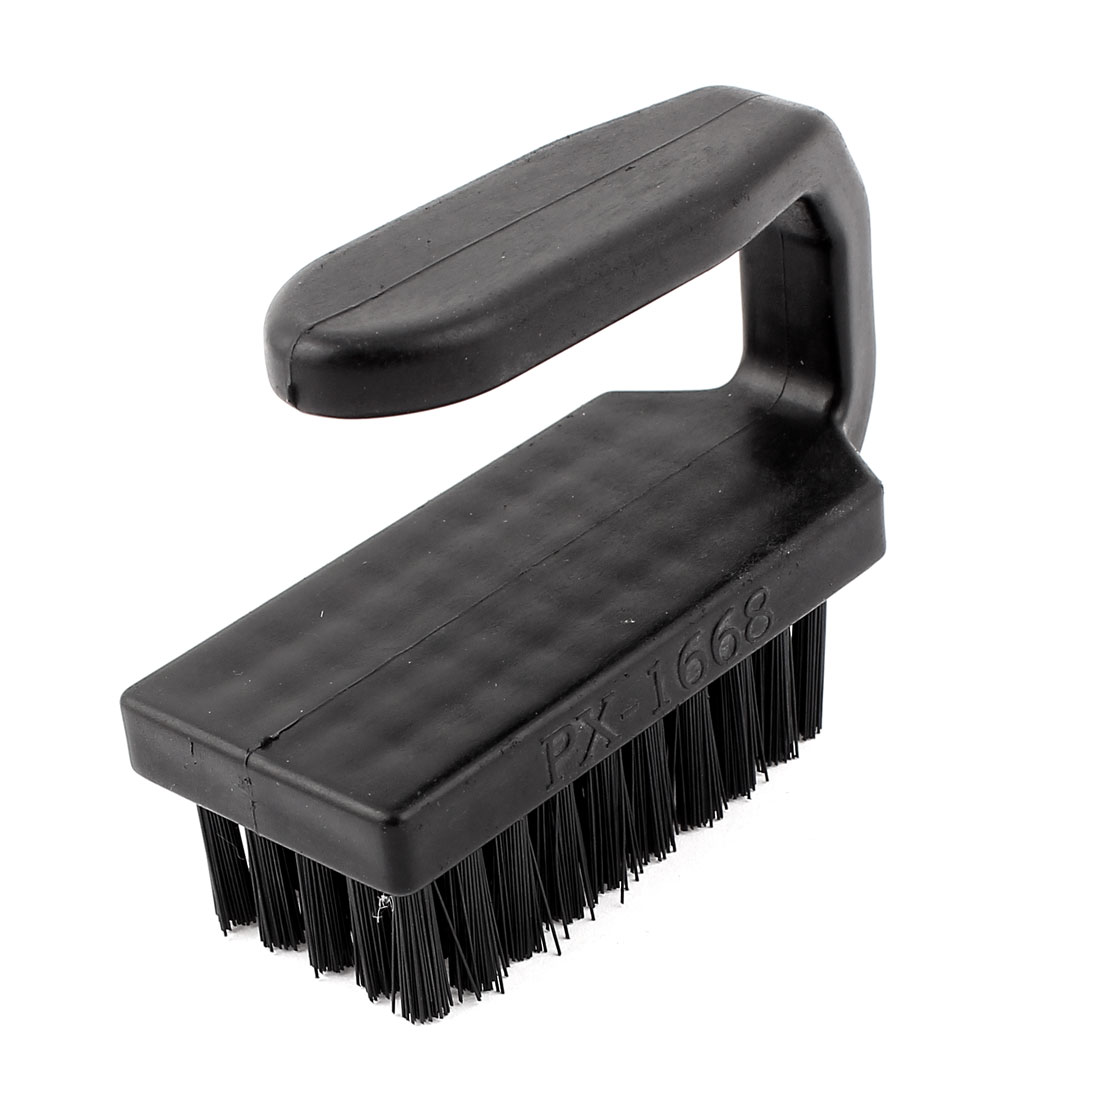 Black Plastic Anti-Static Electronics Cleaning Stiff Bristles Scrub Brush Cleaner